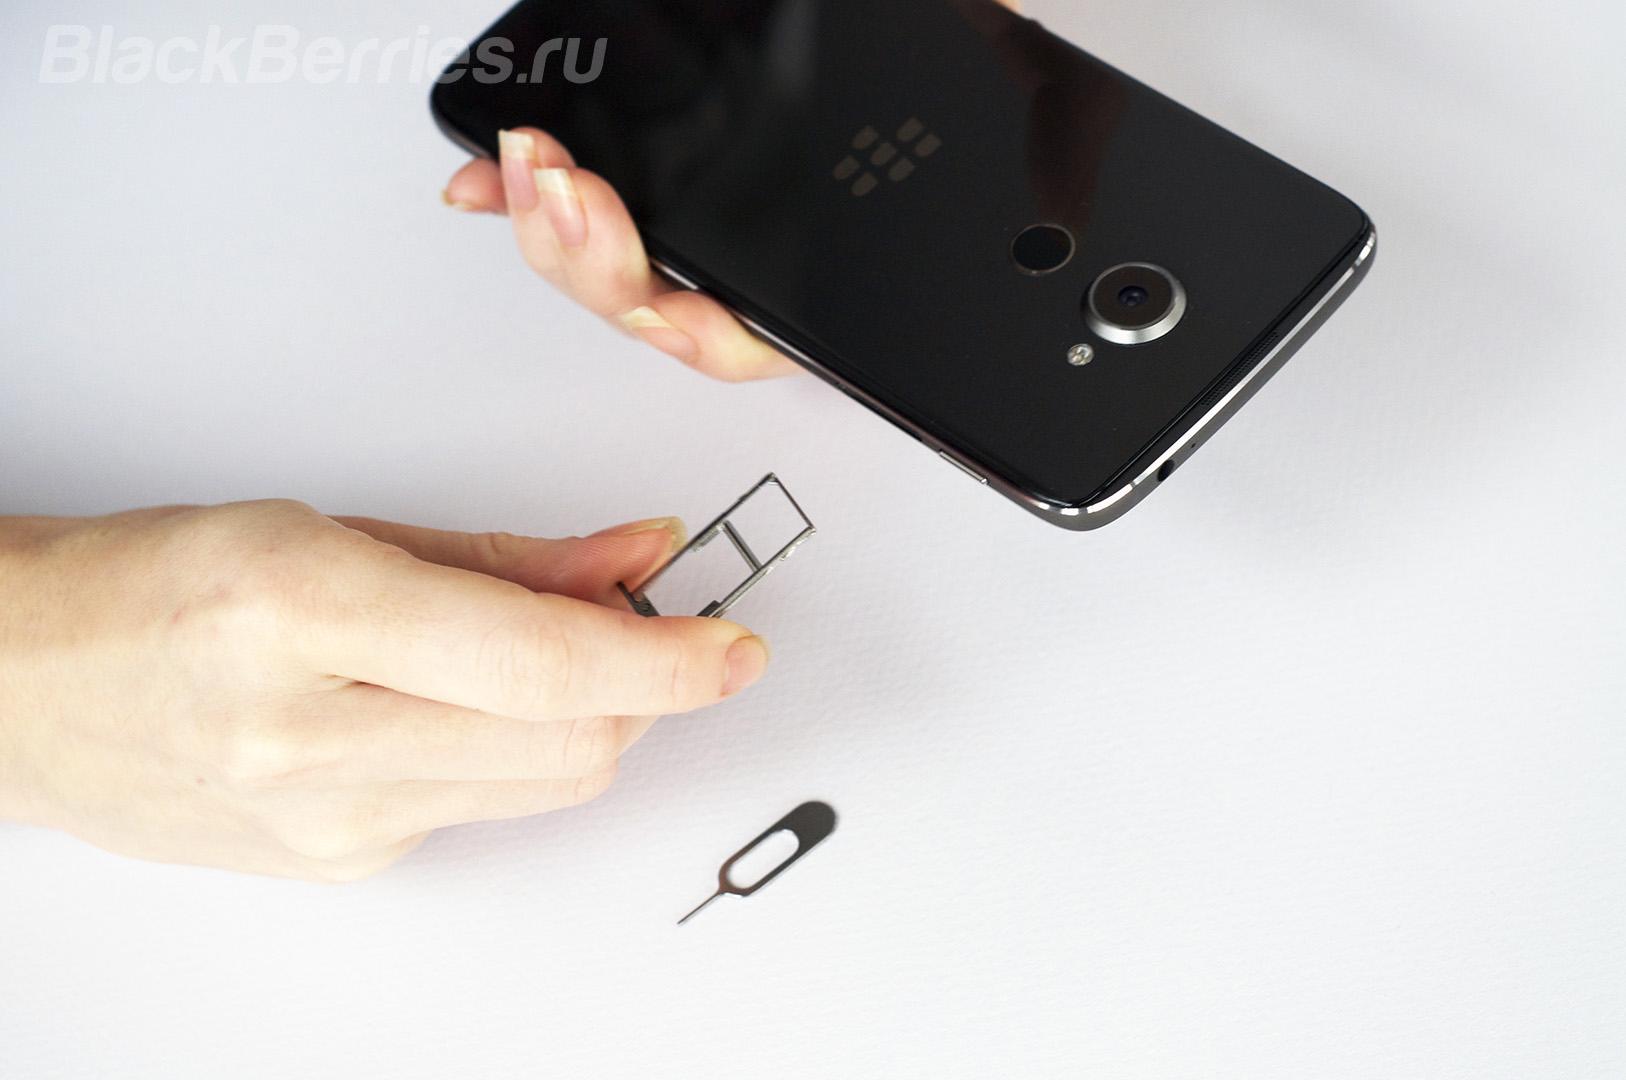 blackberry-dtek60-review-73